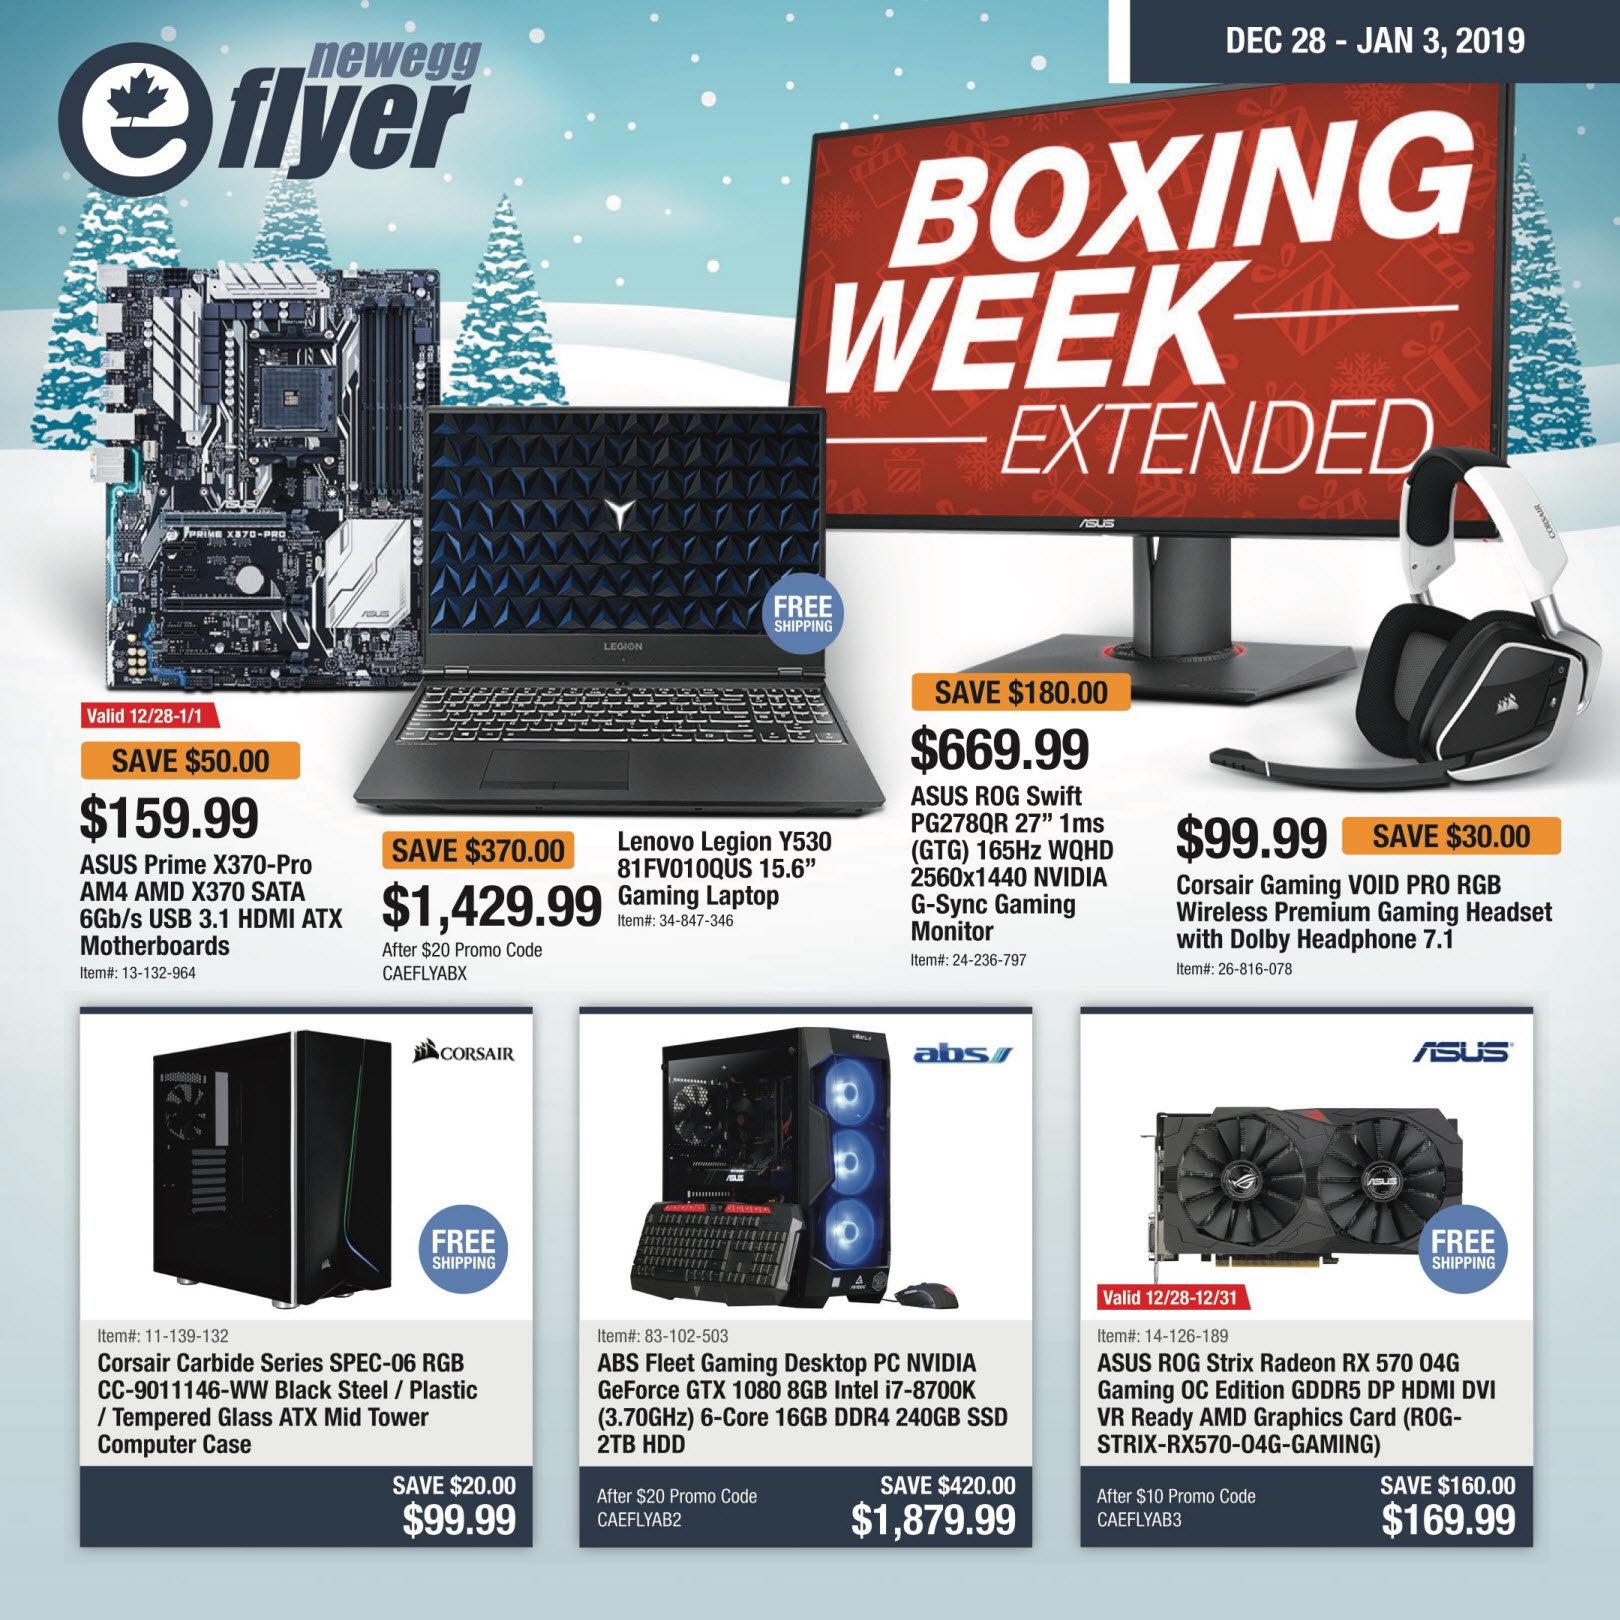 Newegg Weekly Flyer - Boxing Week Extended - Dec 28 – Jan 3